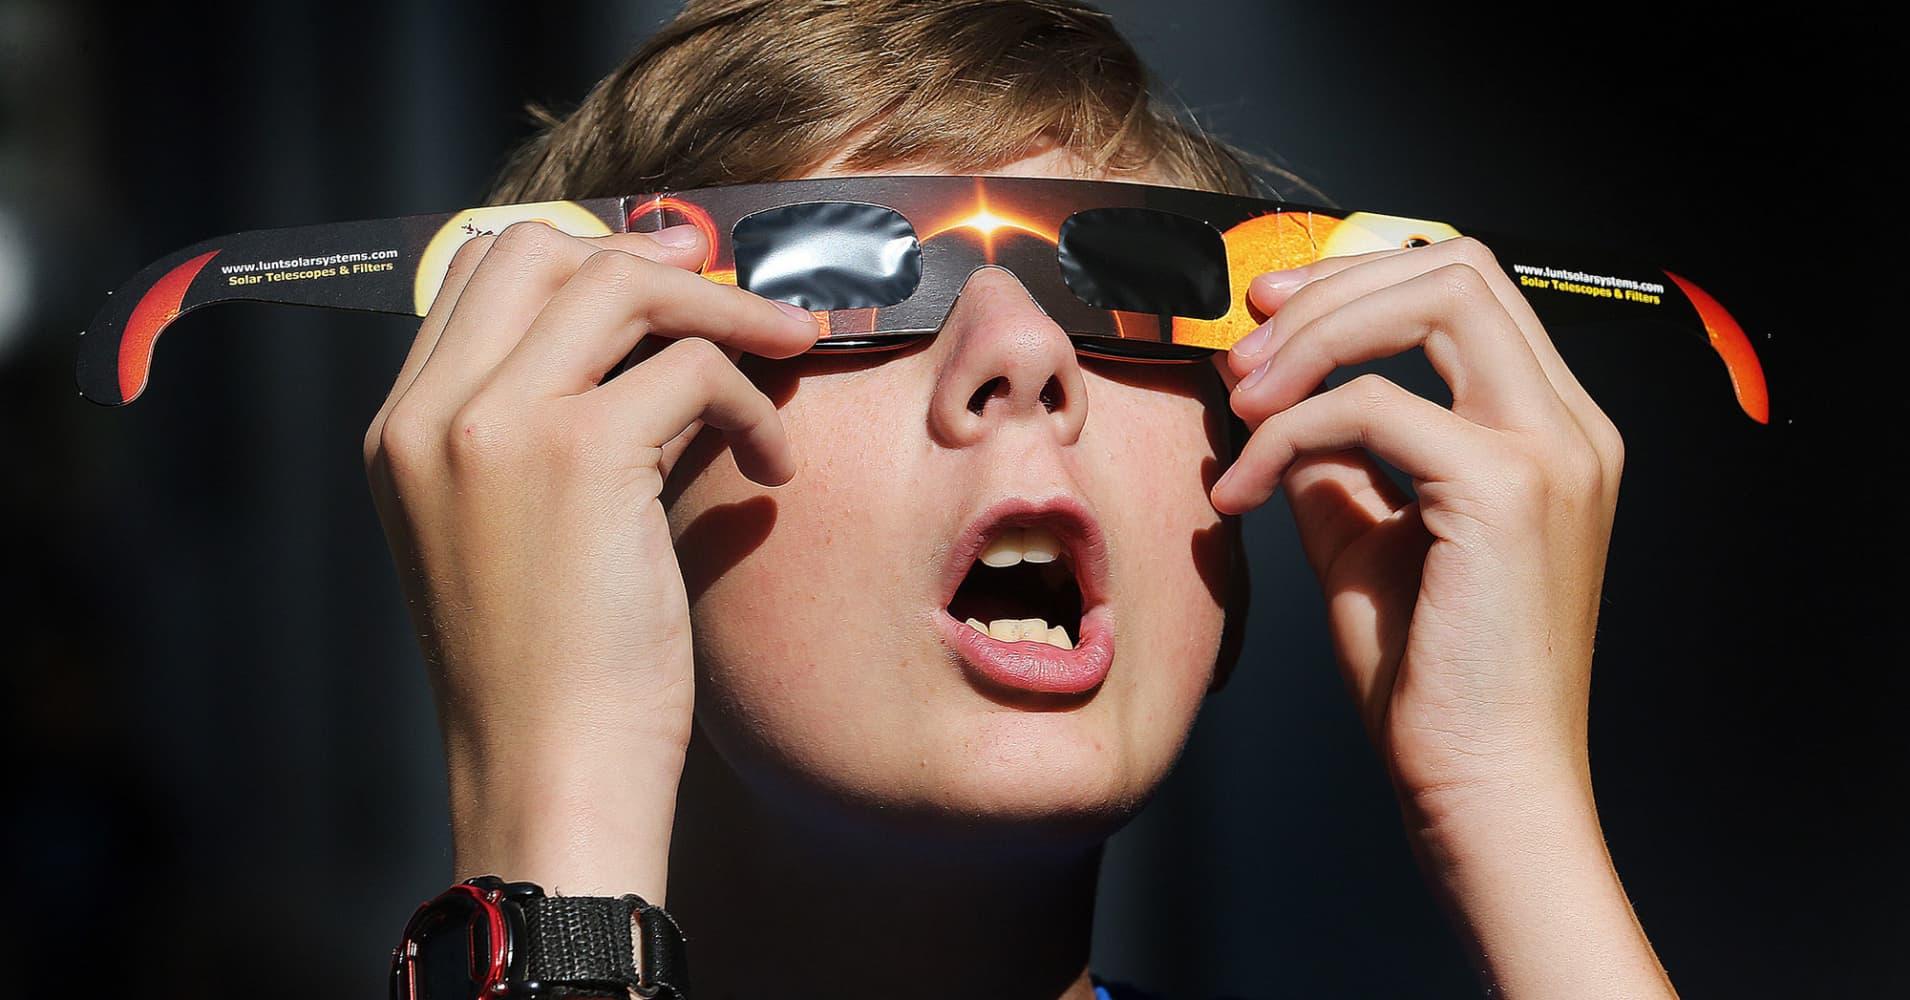 nike shoes photos 2017 eclipse glasses nasa 919937